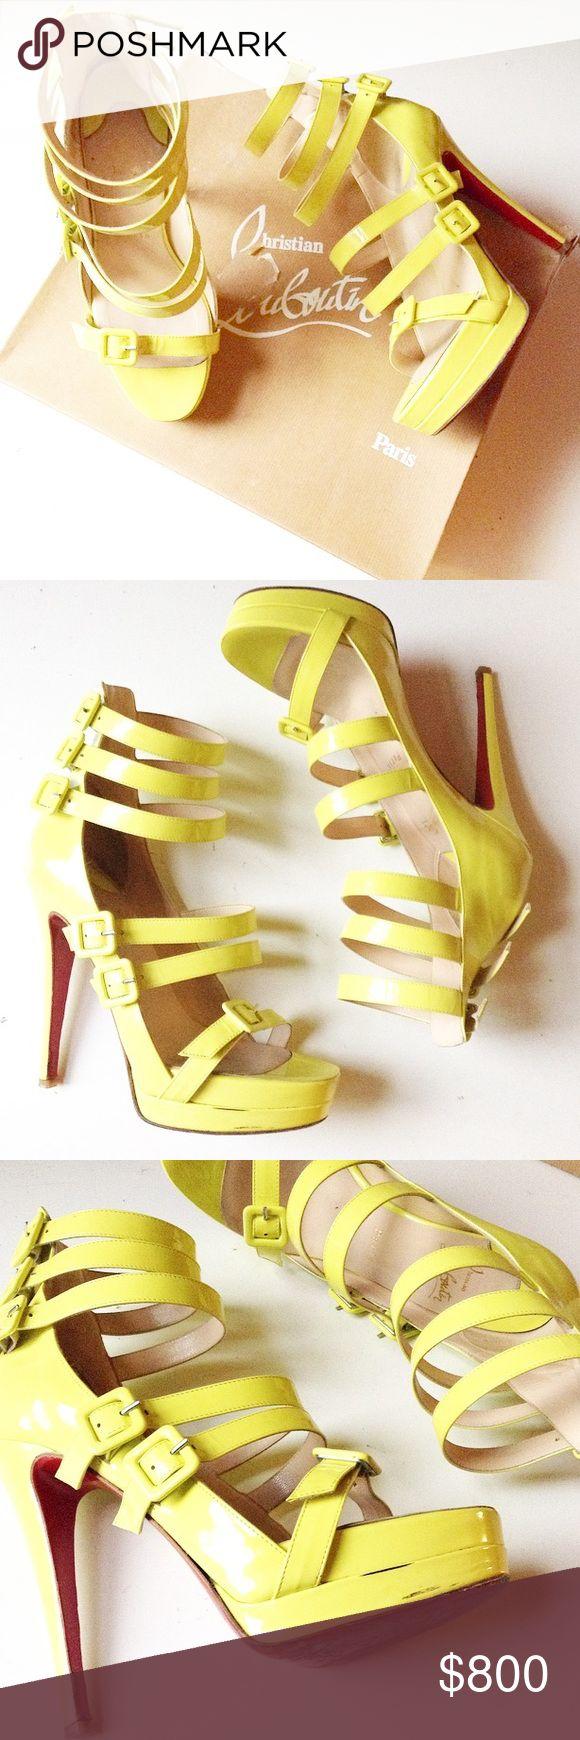 christian louboutin women heels 38.5 where to buy louboutin shoes in maryland